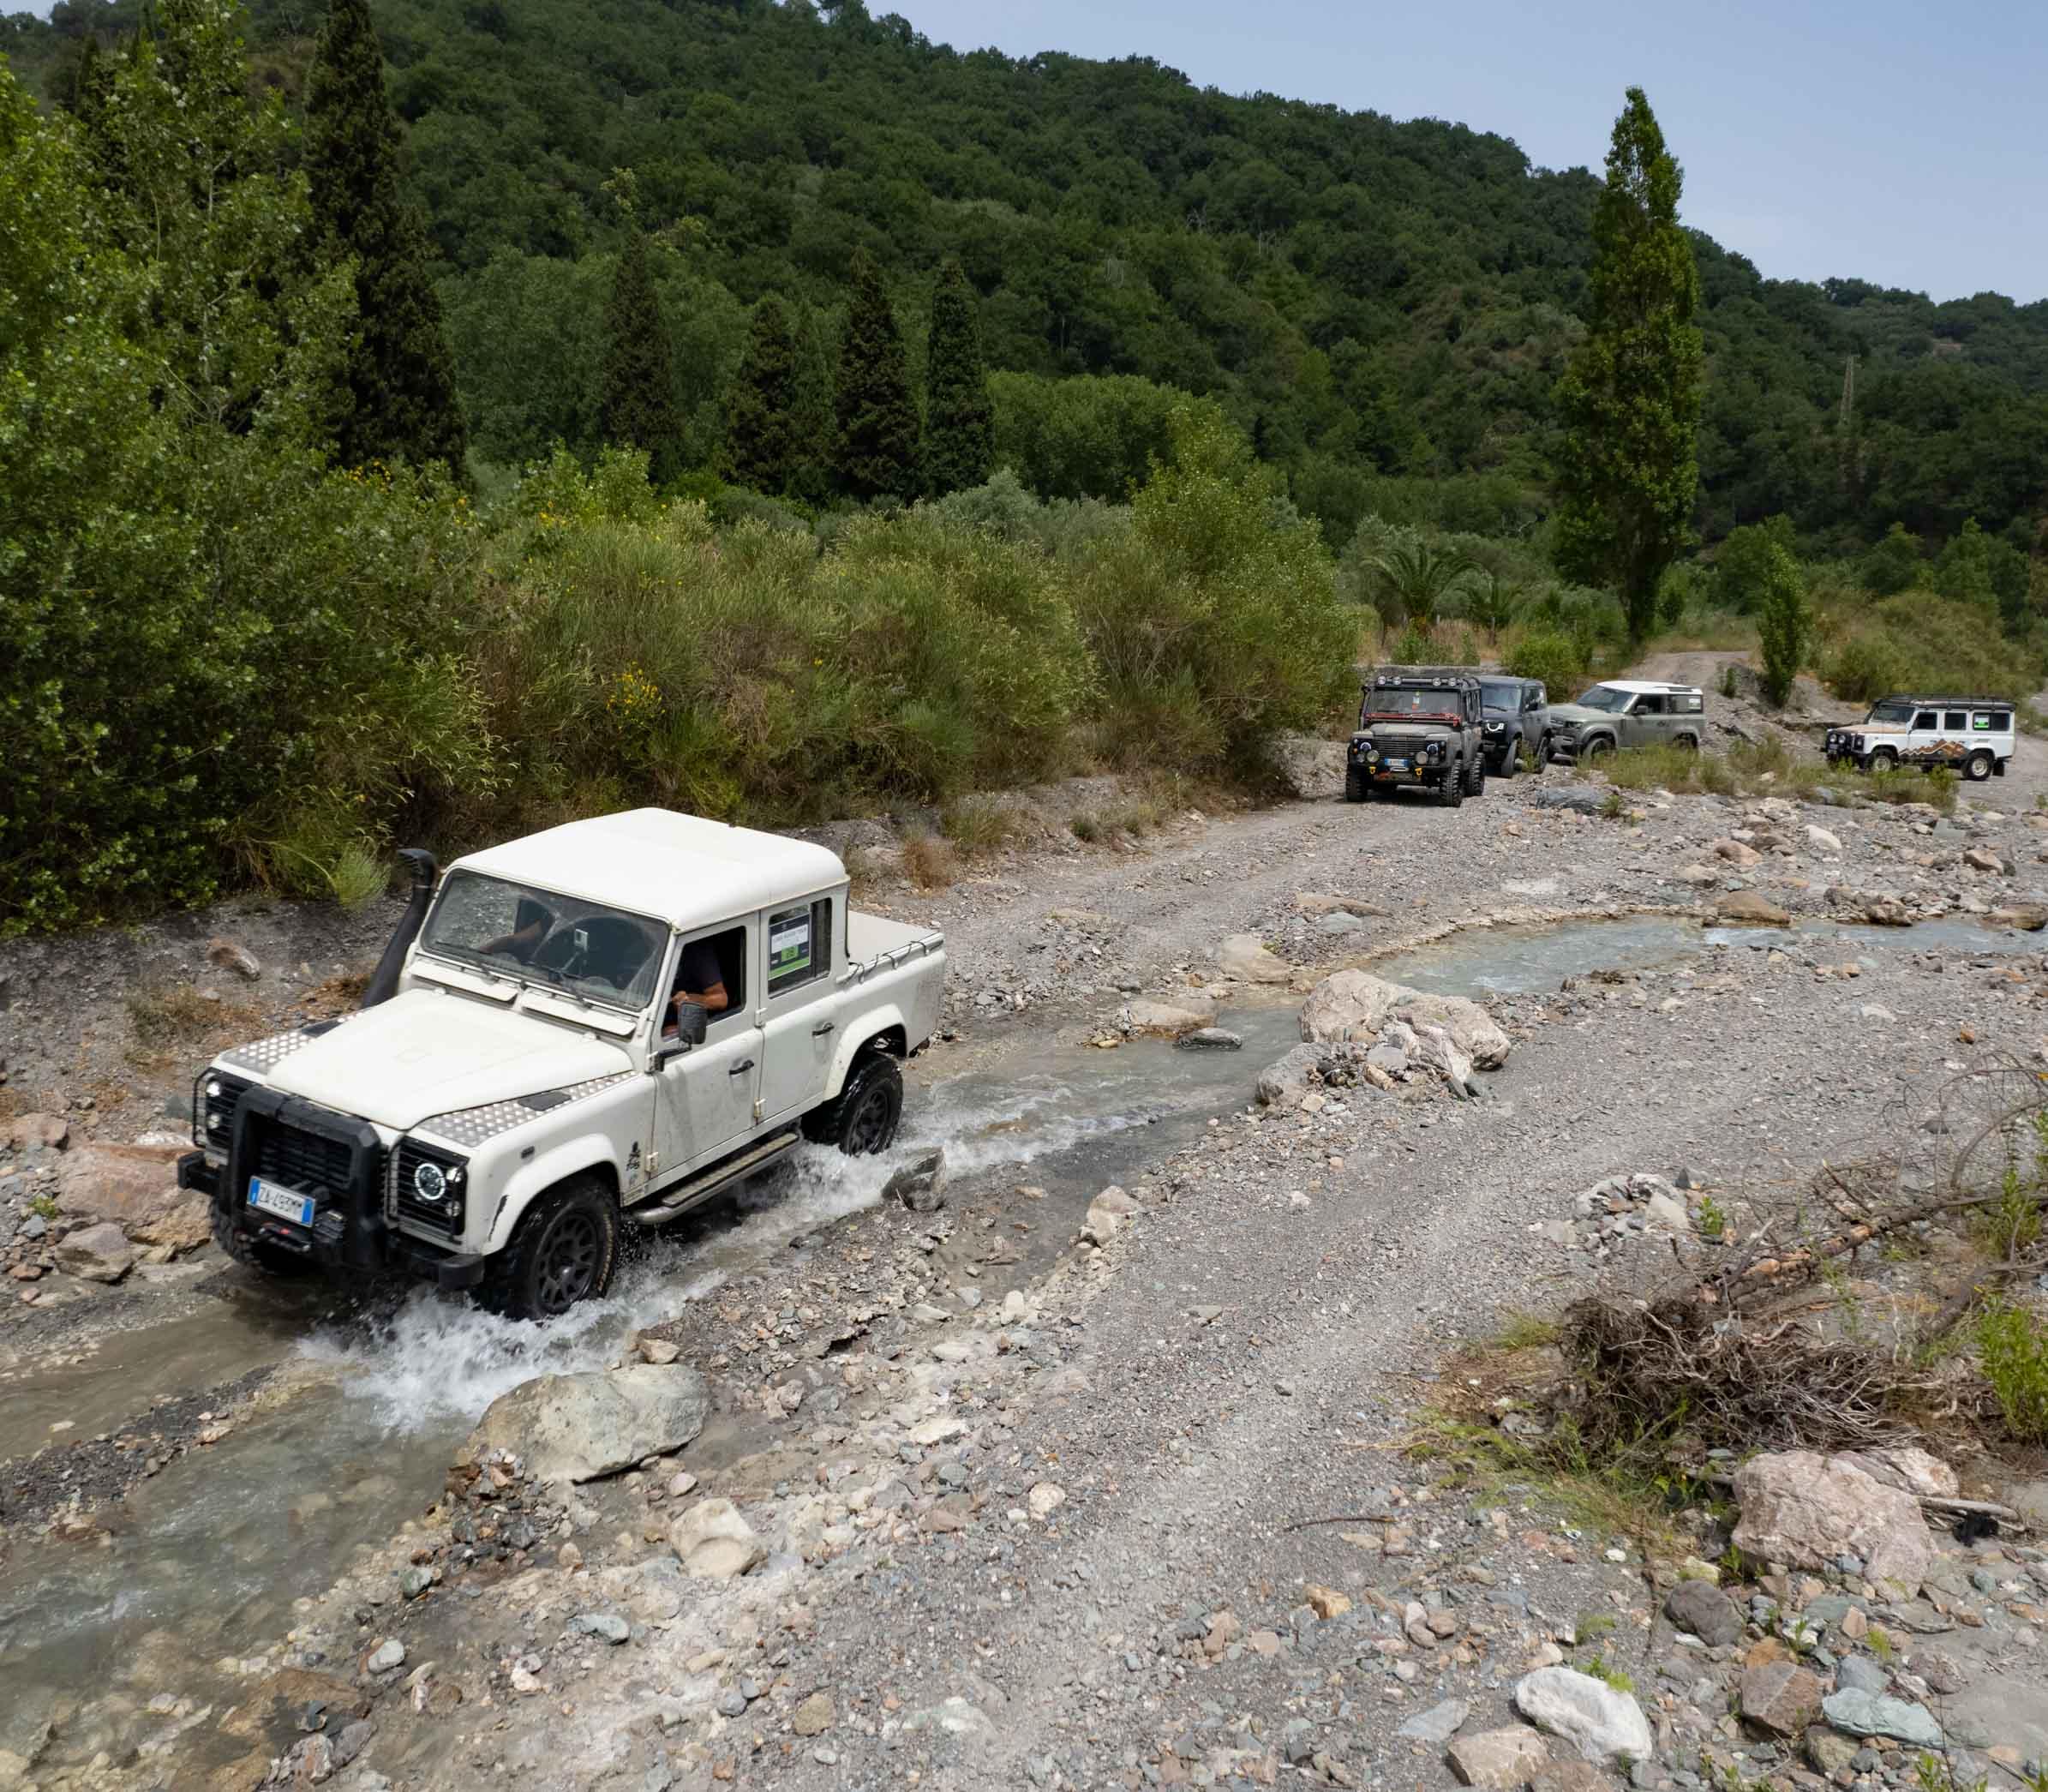 Land_Rover_Tour_Sicilia_2021_Land_Rover_Experience_Italia_-25